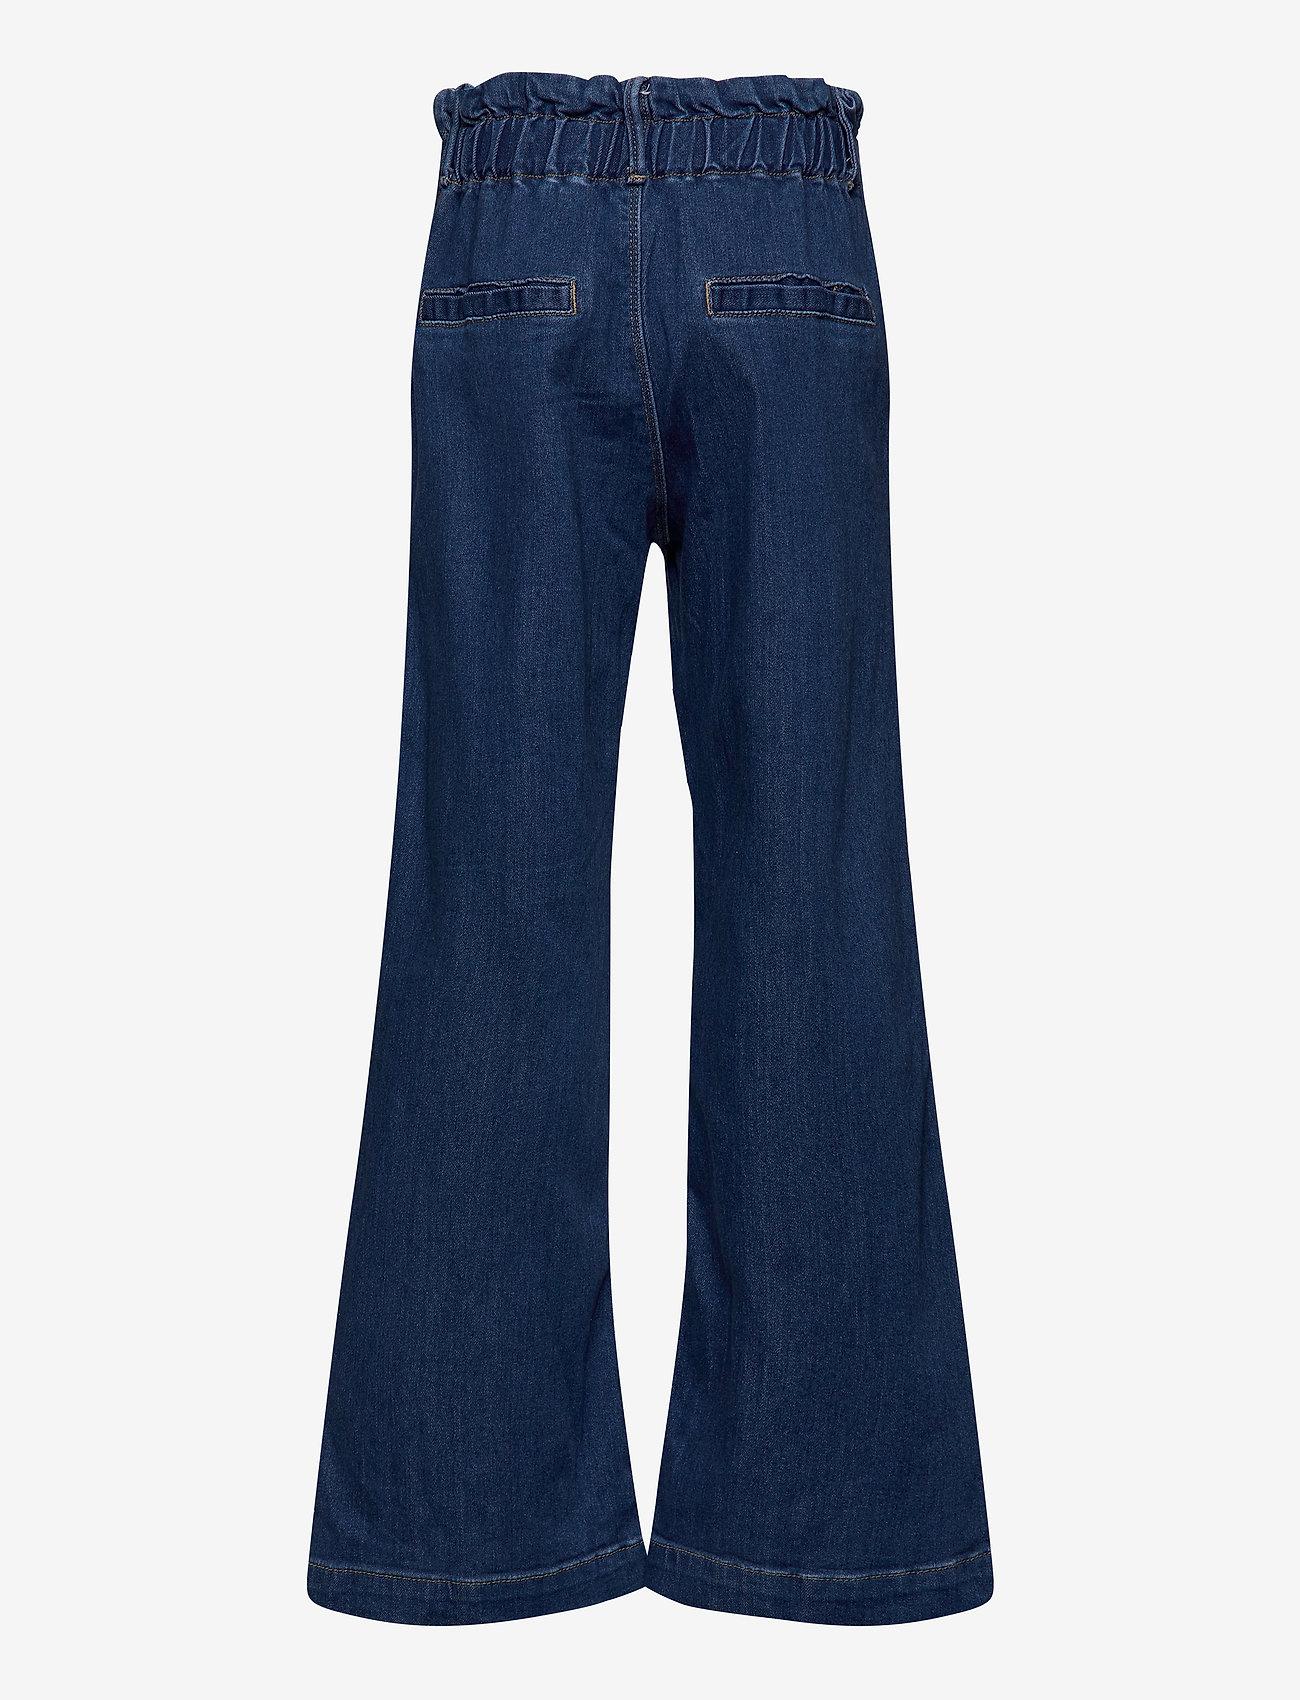 Nlfberta Dnmatasper 2381 Wide Ancle Pant (Medium Blue Denim) (33.74 €) - LMTD 5ivXM